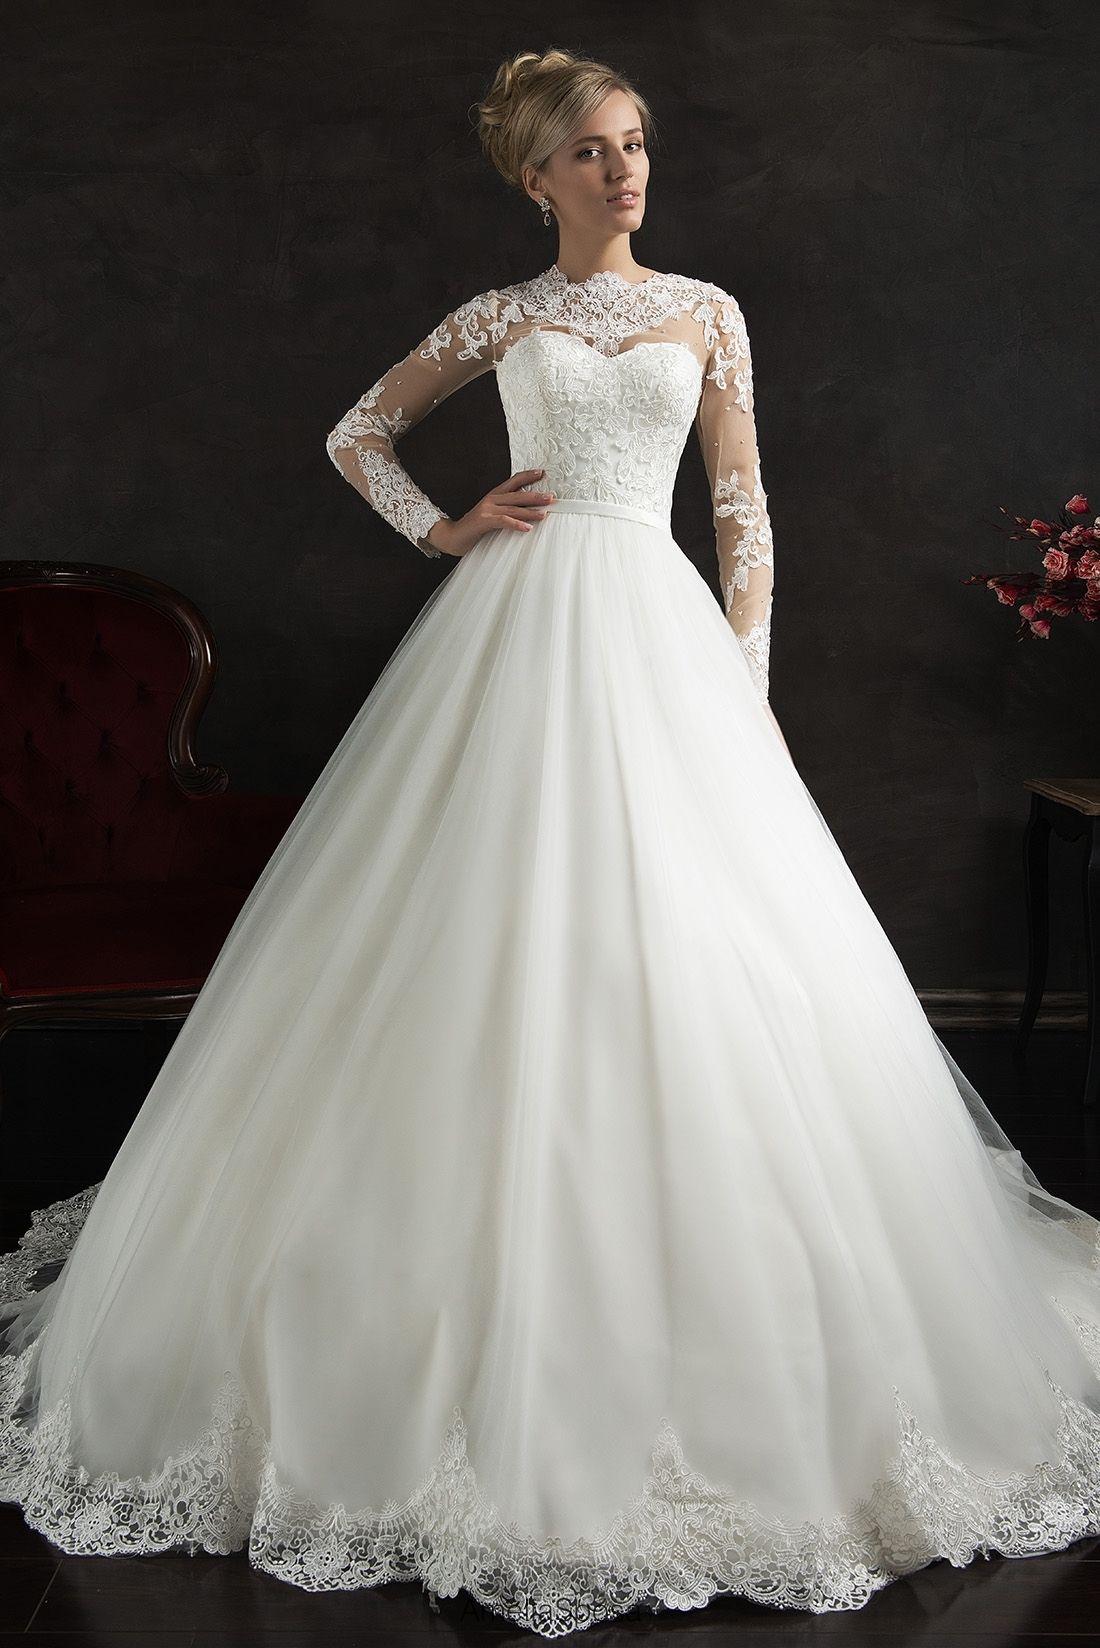 princess wedding dress   Fashion Dress > Wedding Dresses > 2017 ...